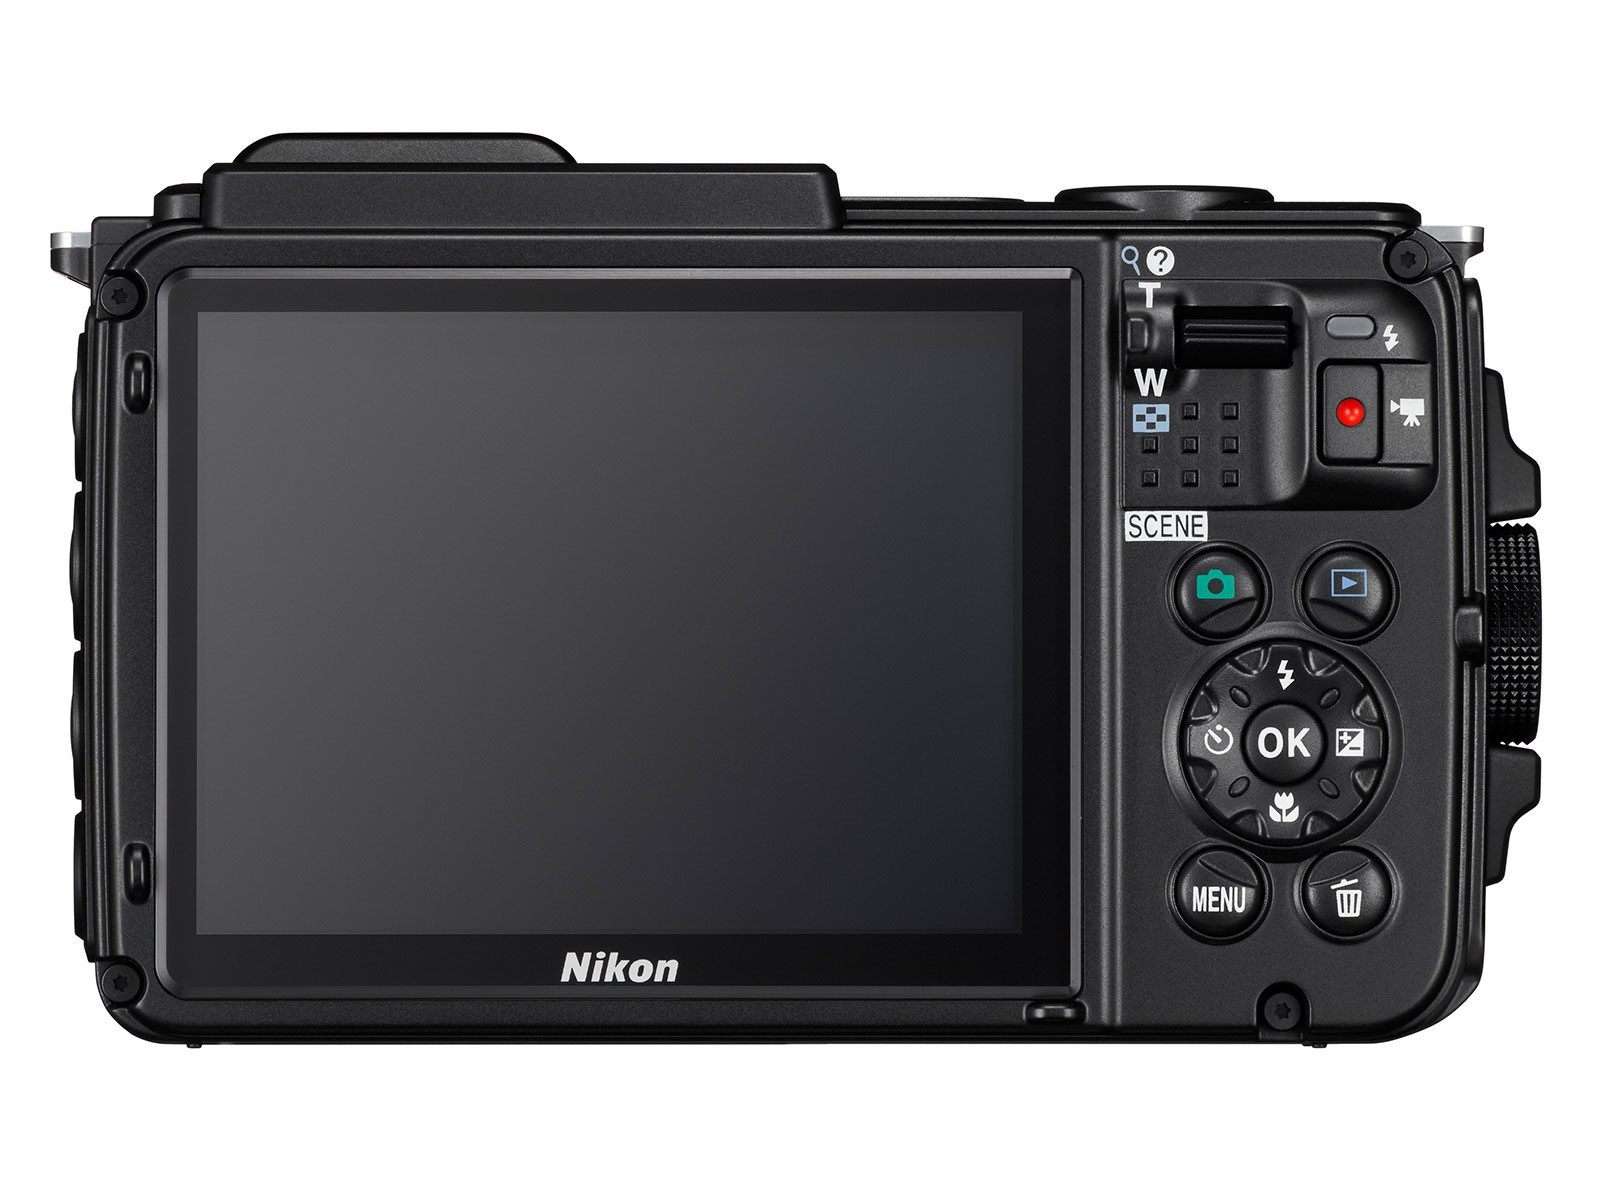 Nikon Coolpix AW130 3 colos kijelző, 921 ezer képponttal.